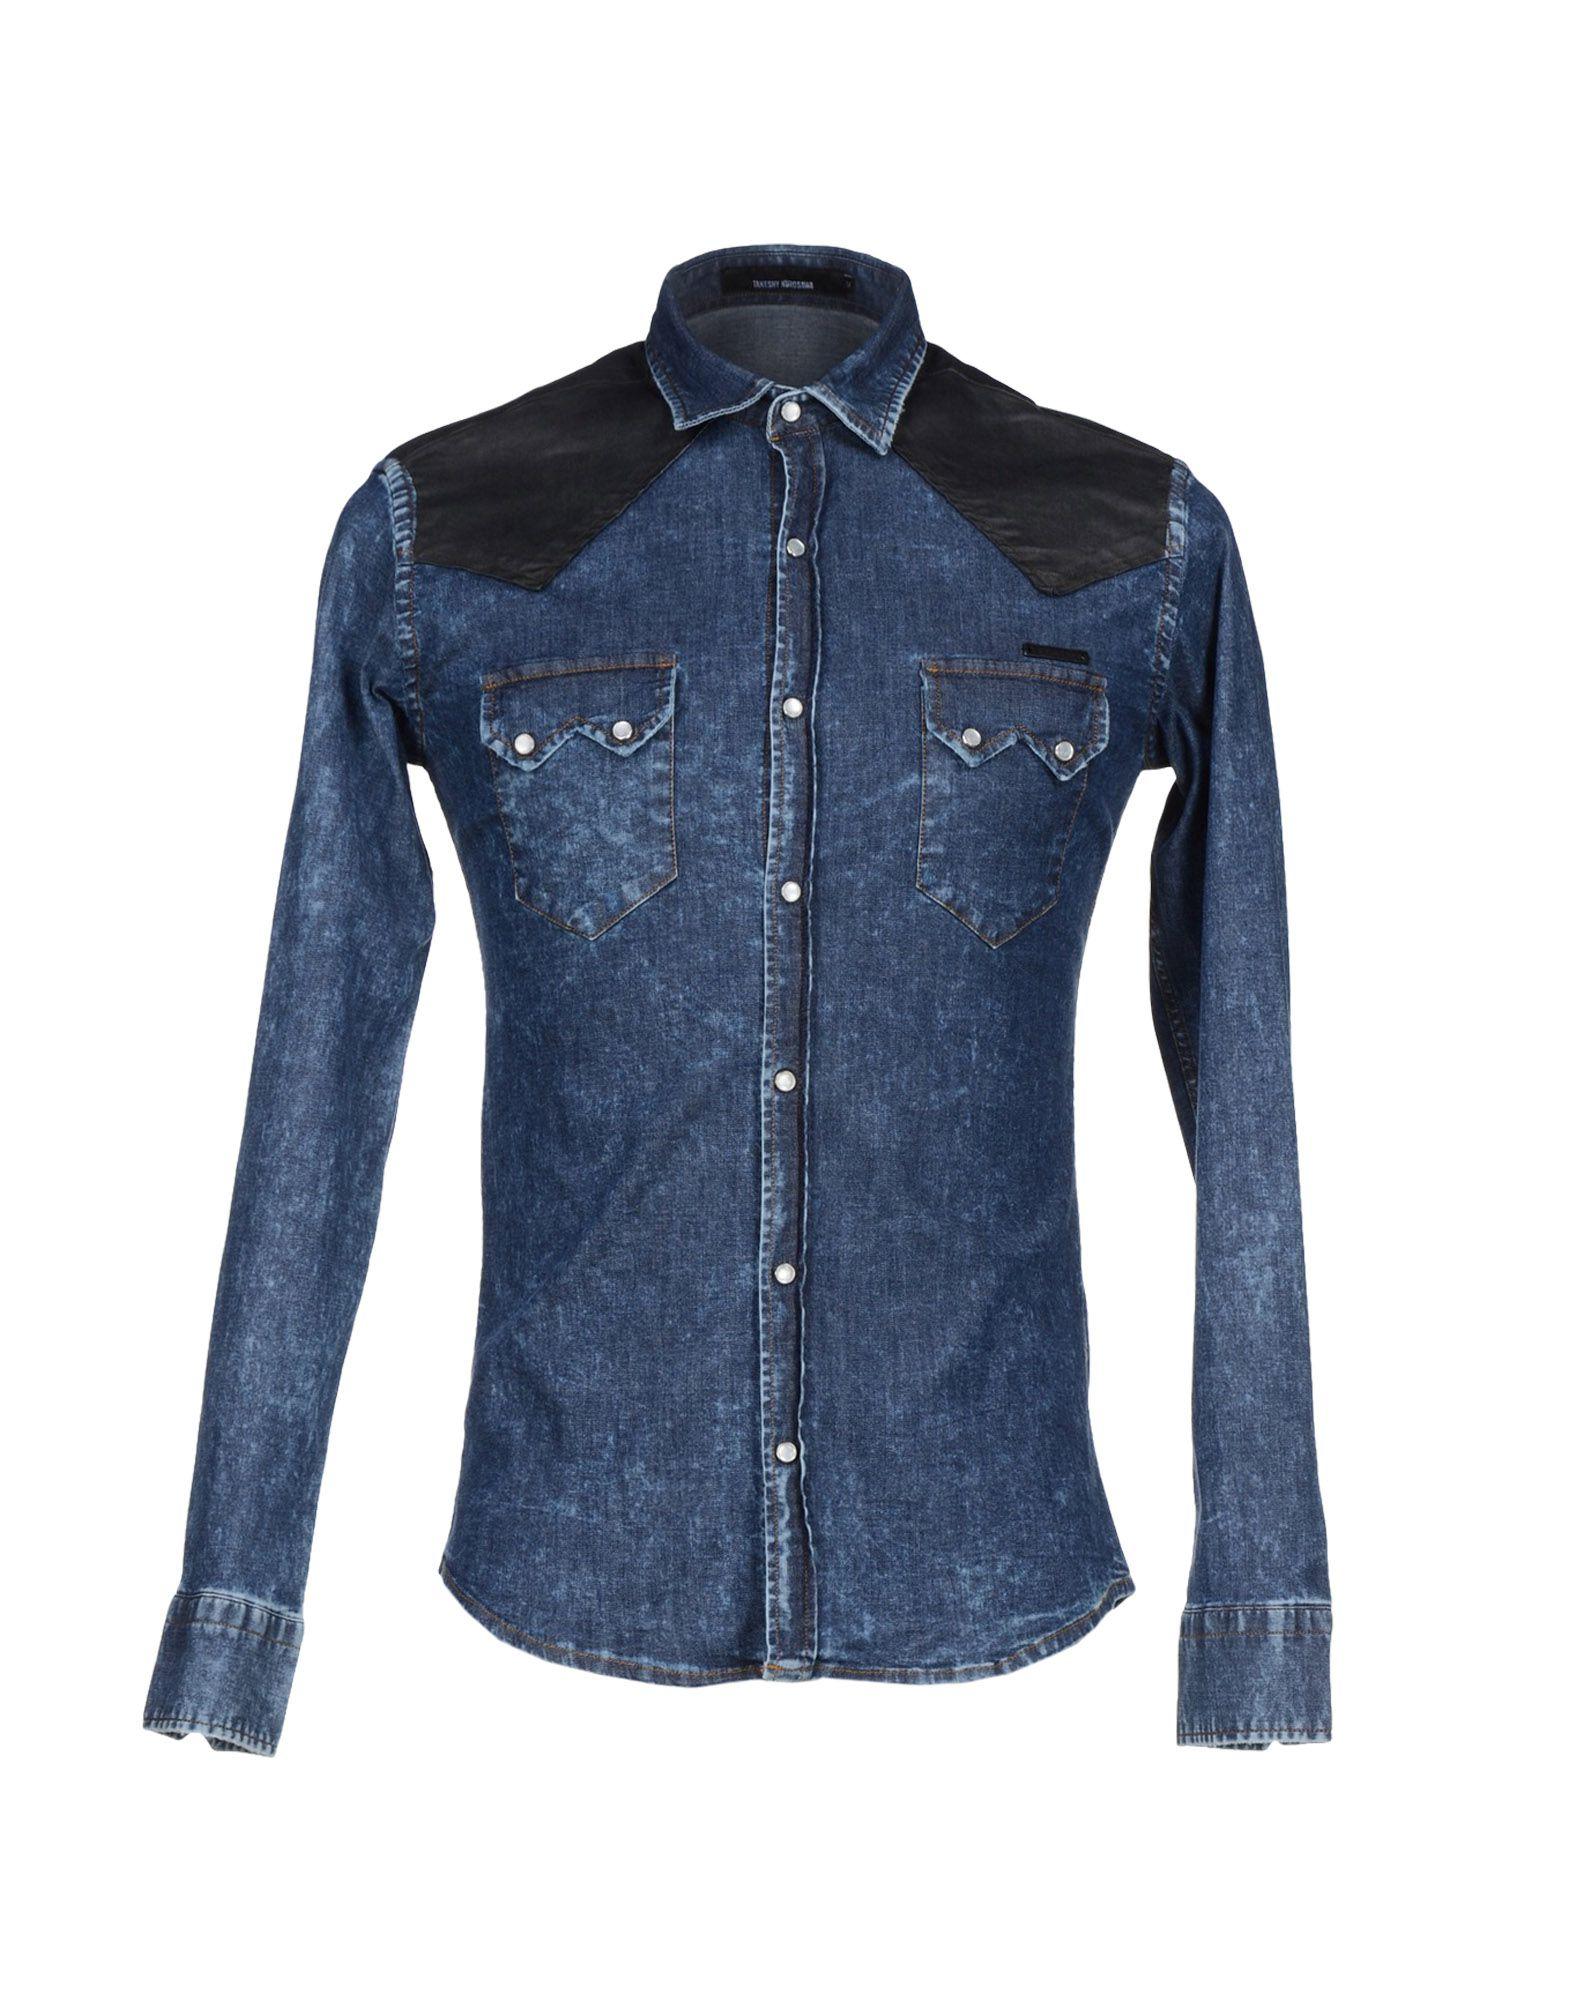 Lyst - Takeshy Kurosawa Denim Shirt in Blue for Men